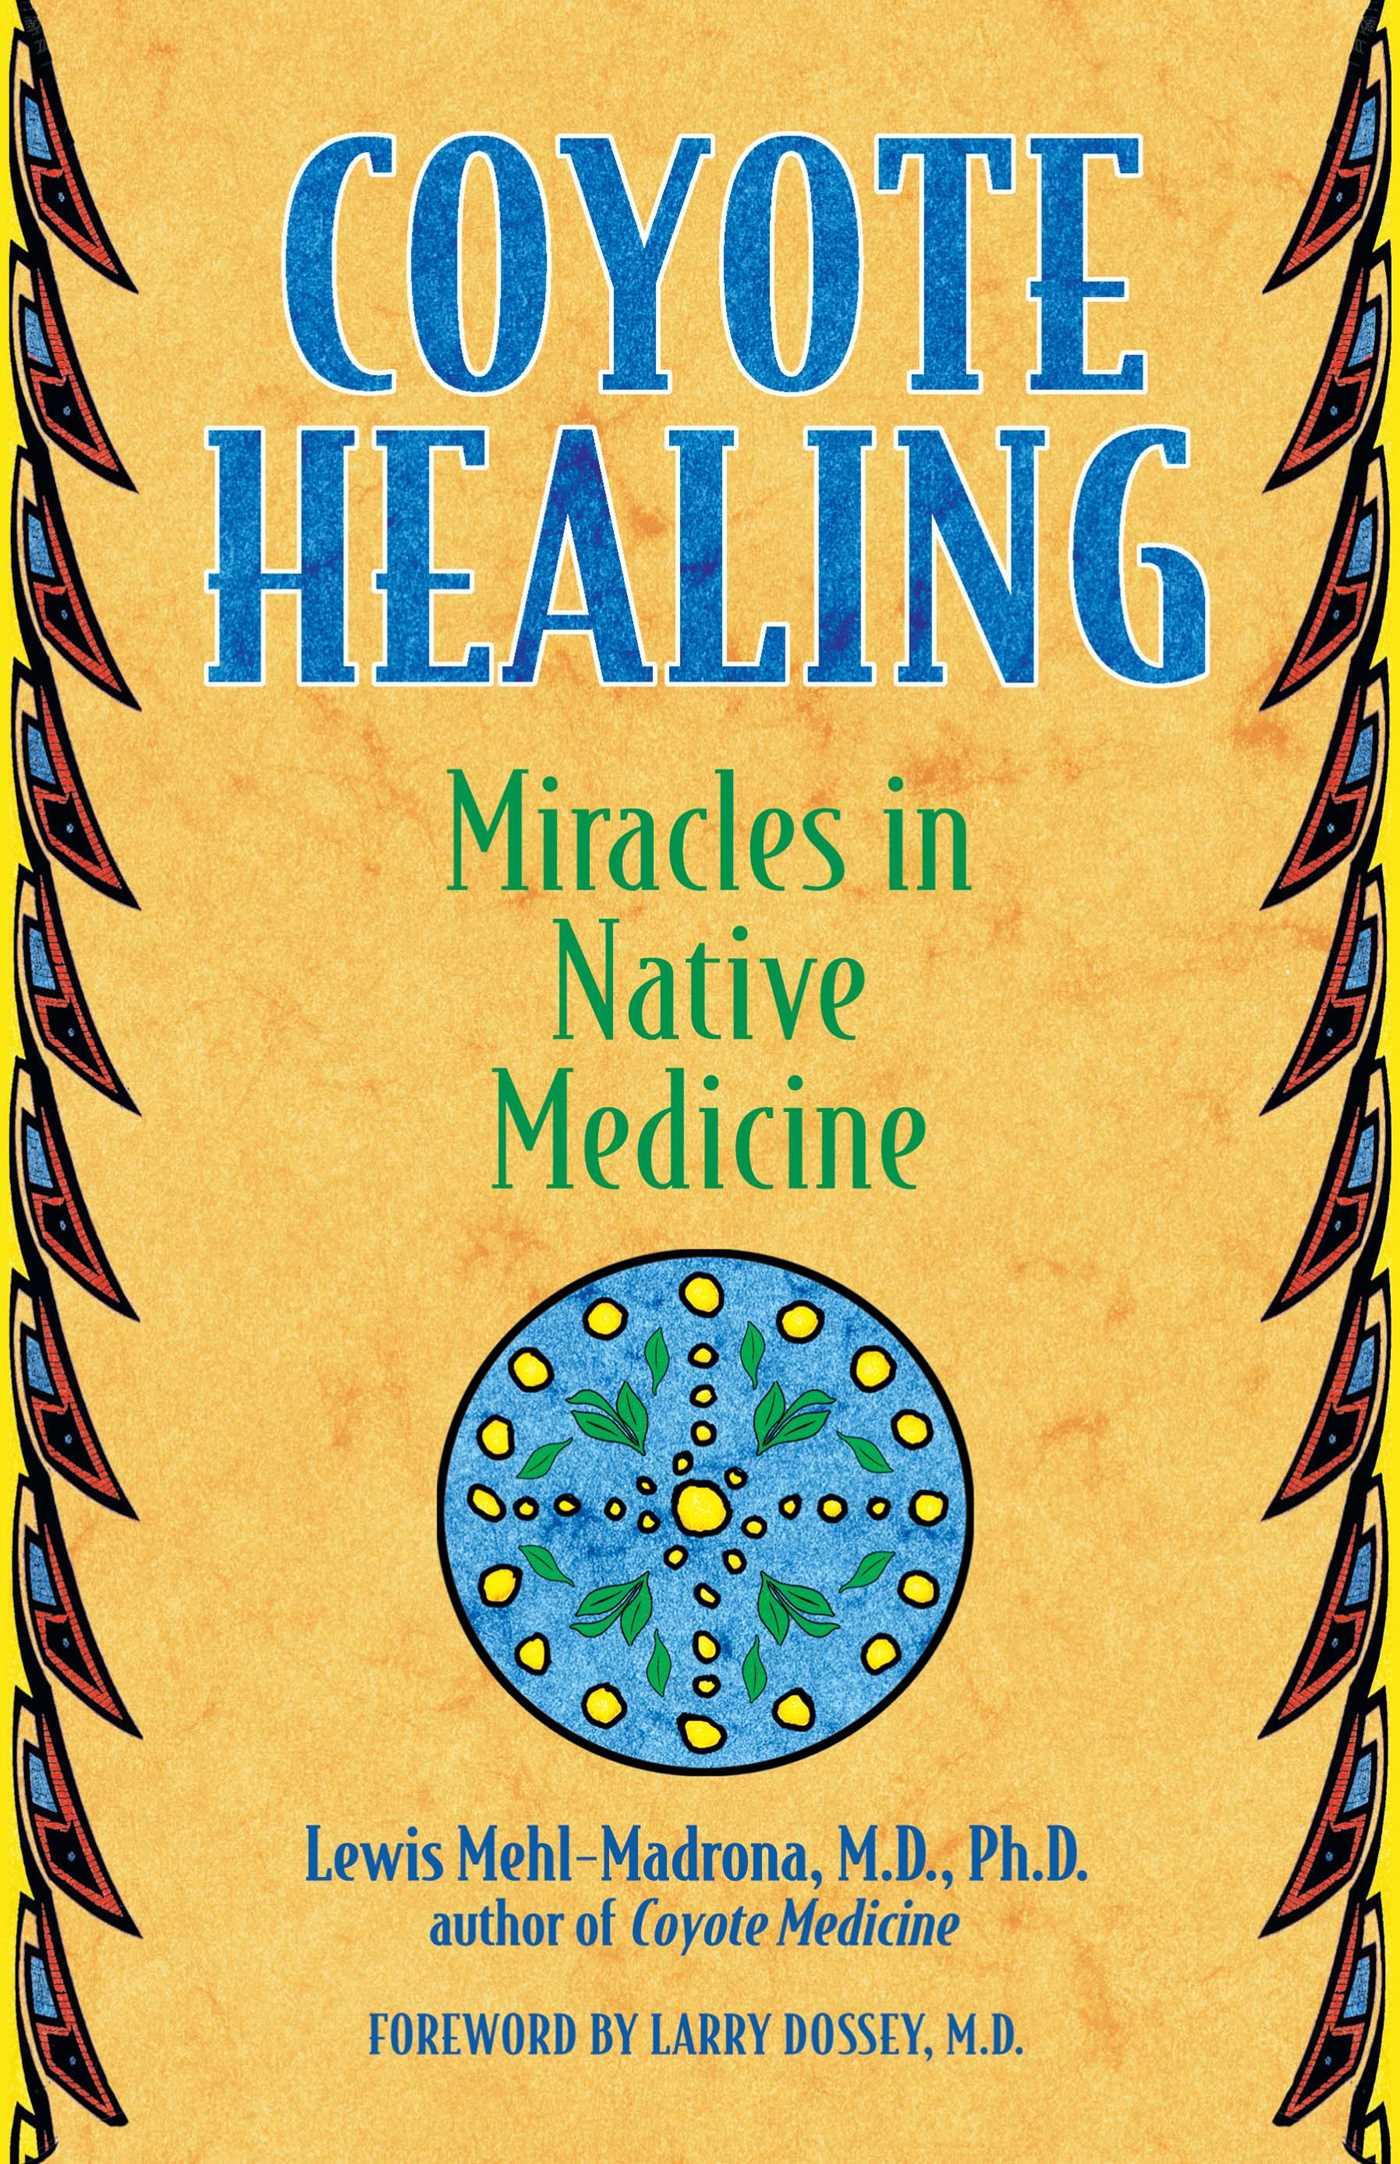 Coyote healing 9781591430100 hr